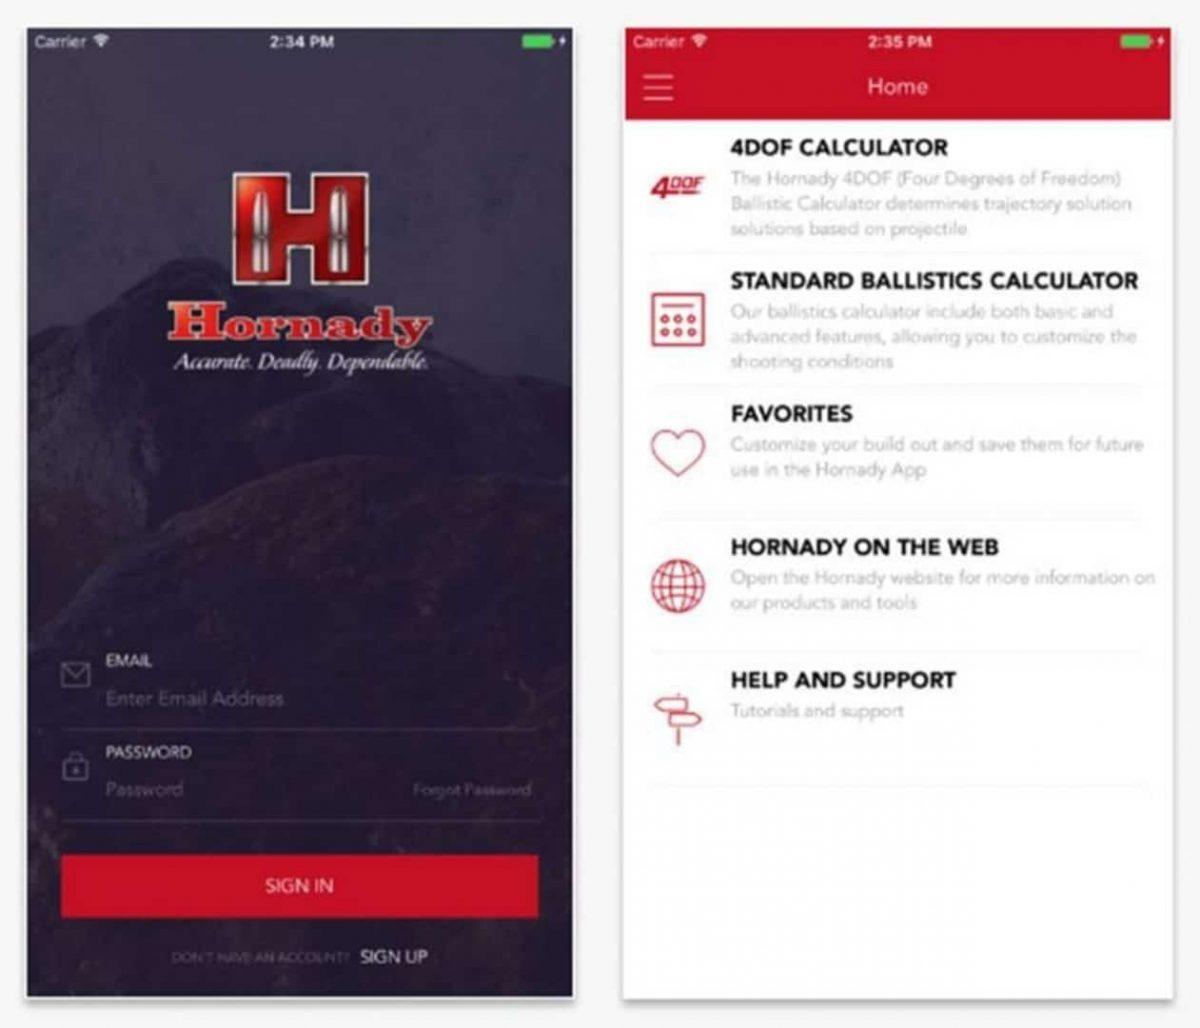 Get the Hornady Ballistic Calculator App with 4DOF